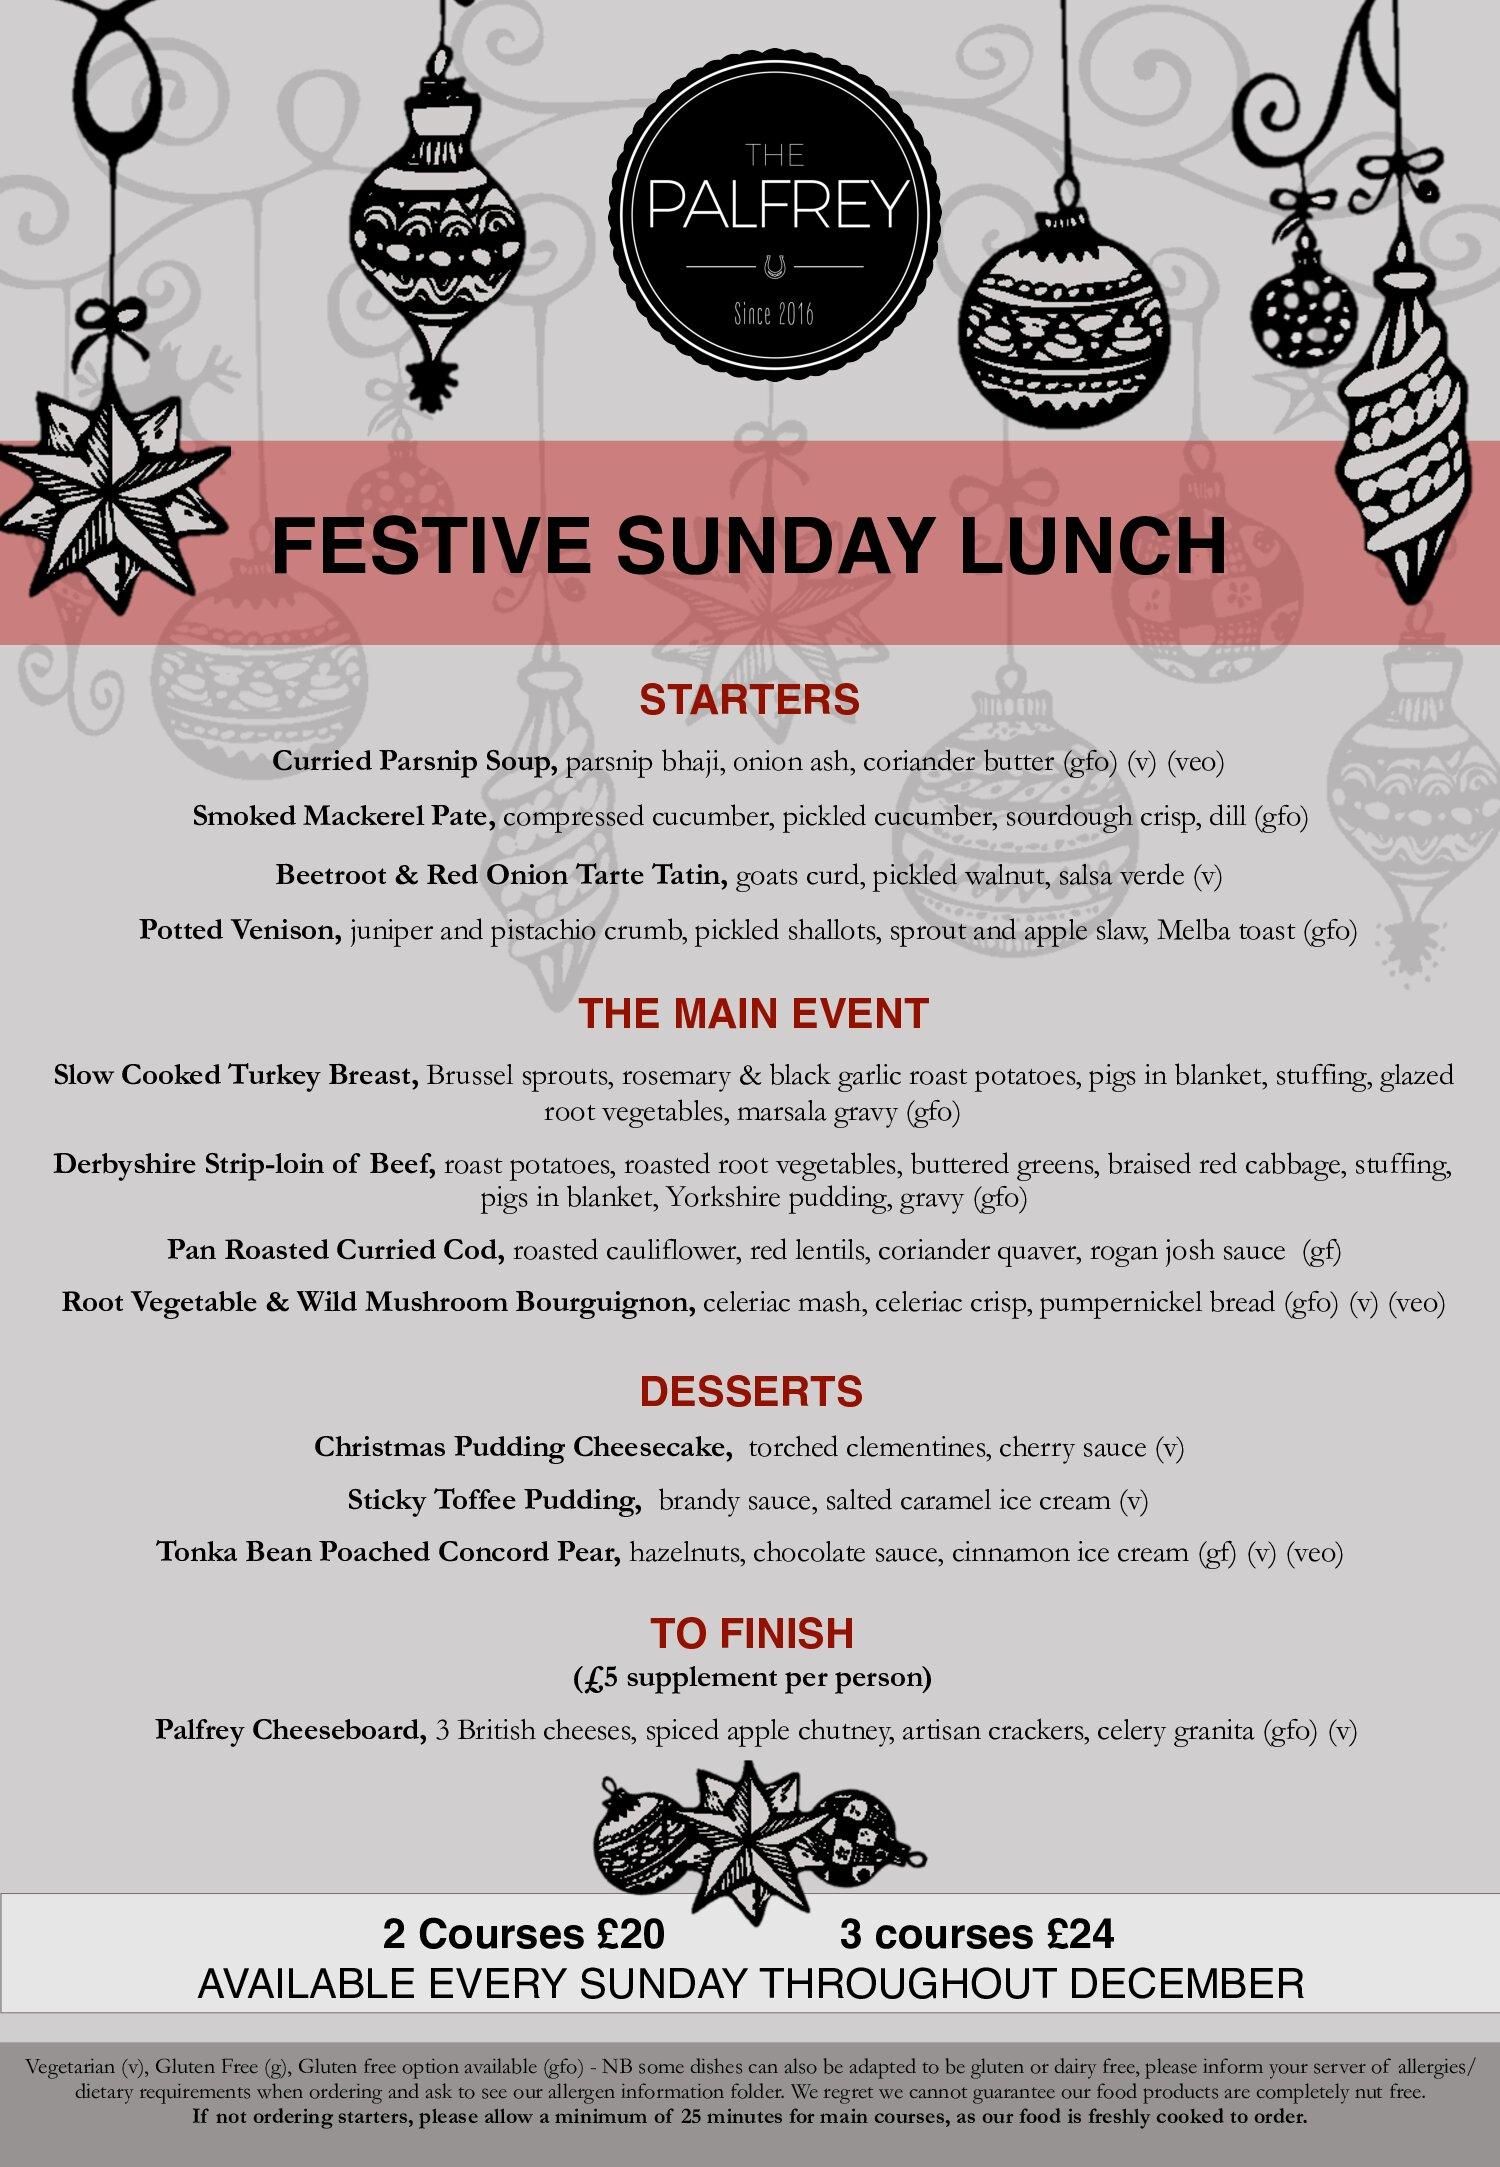 Festive-Sunday-Lunch_1-1